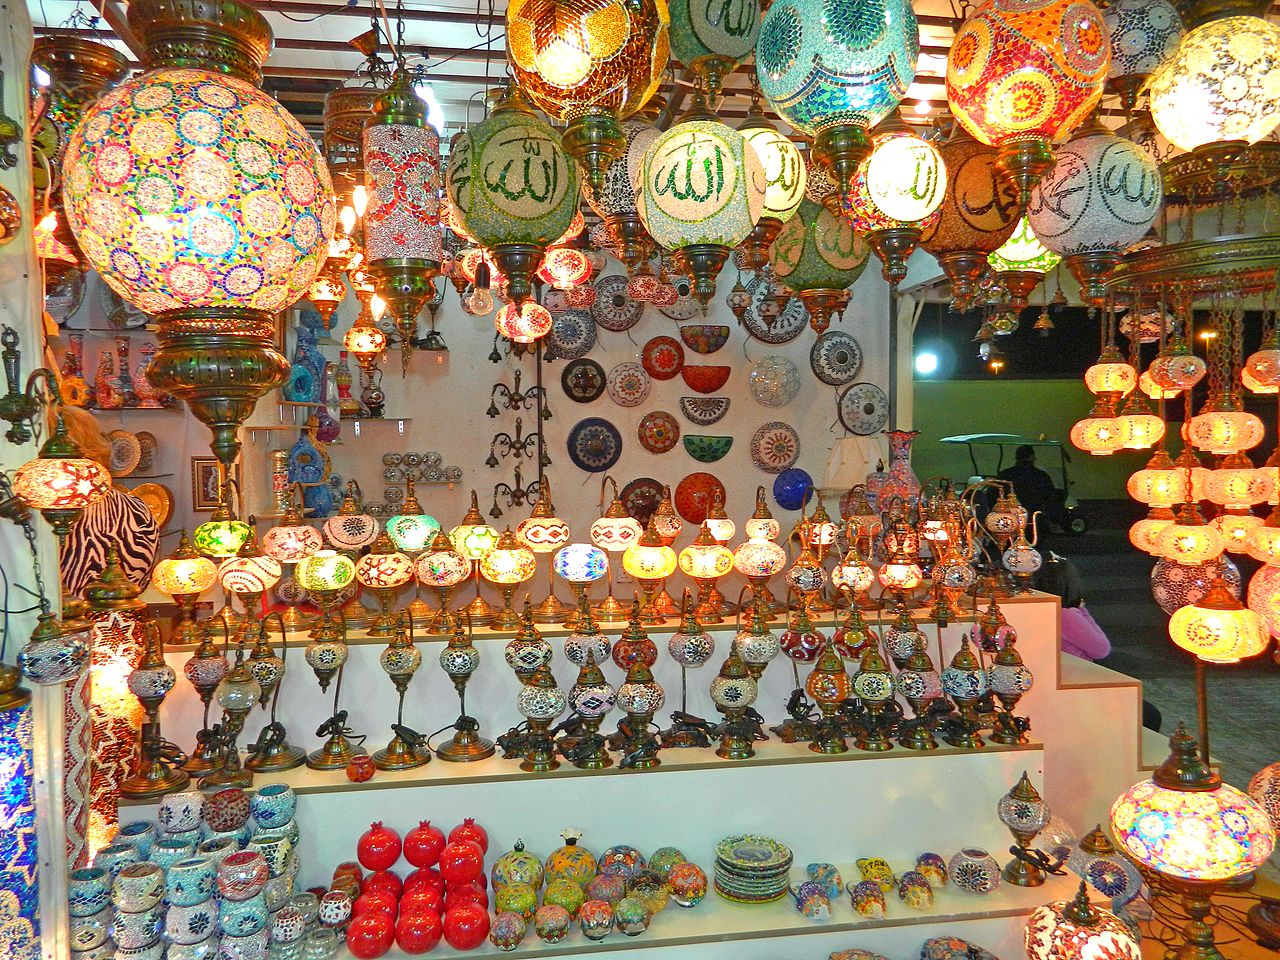 filetraditional decorative lampsjpg - Decorative Lamps